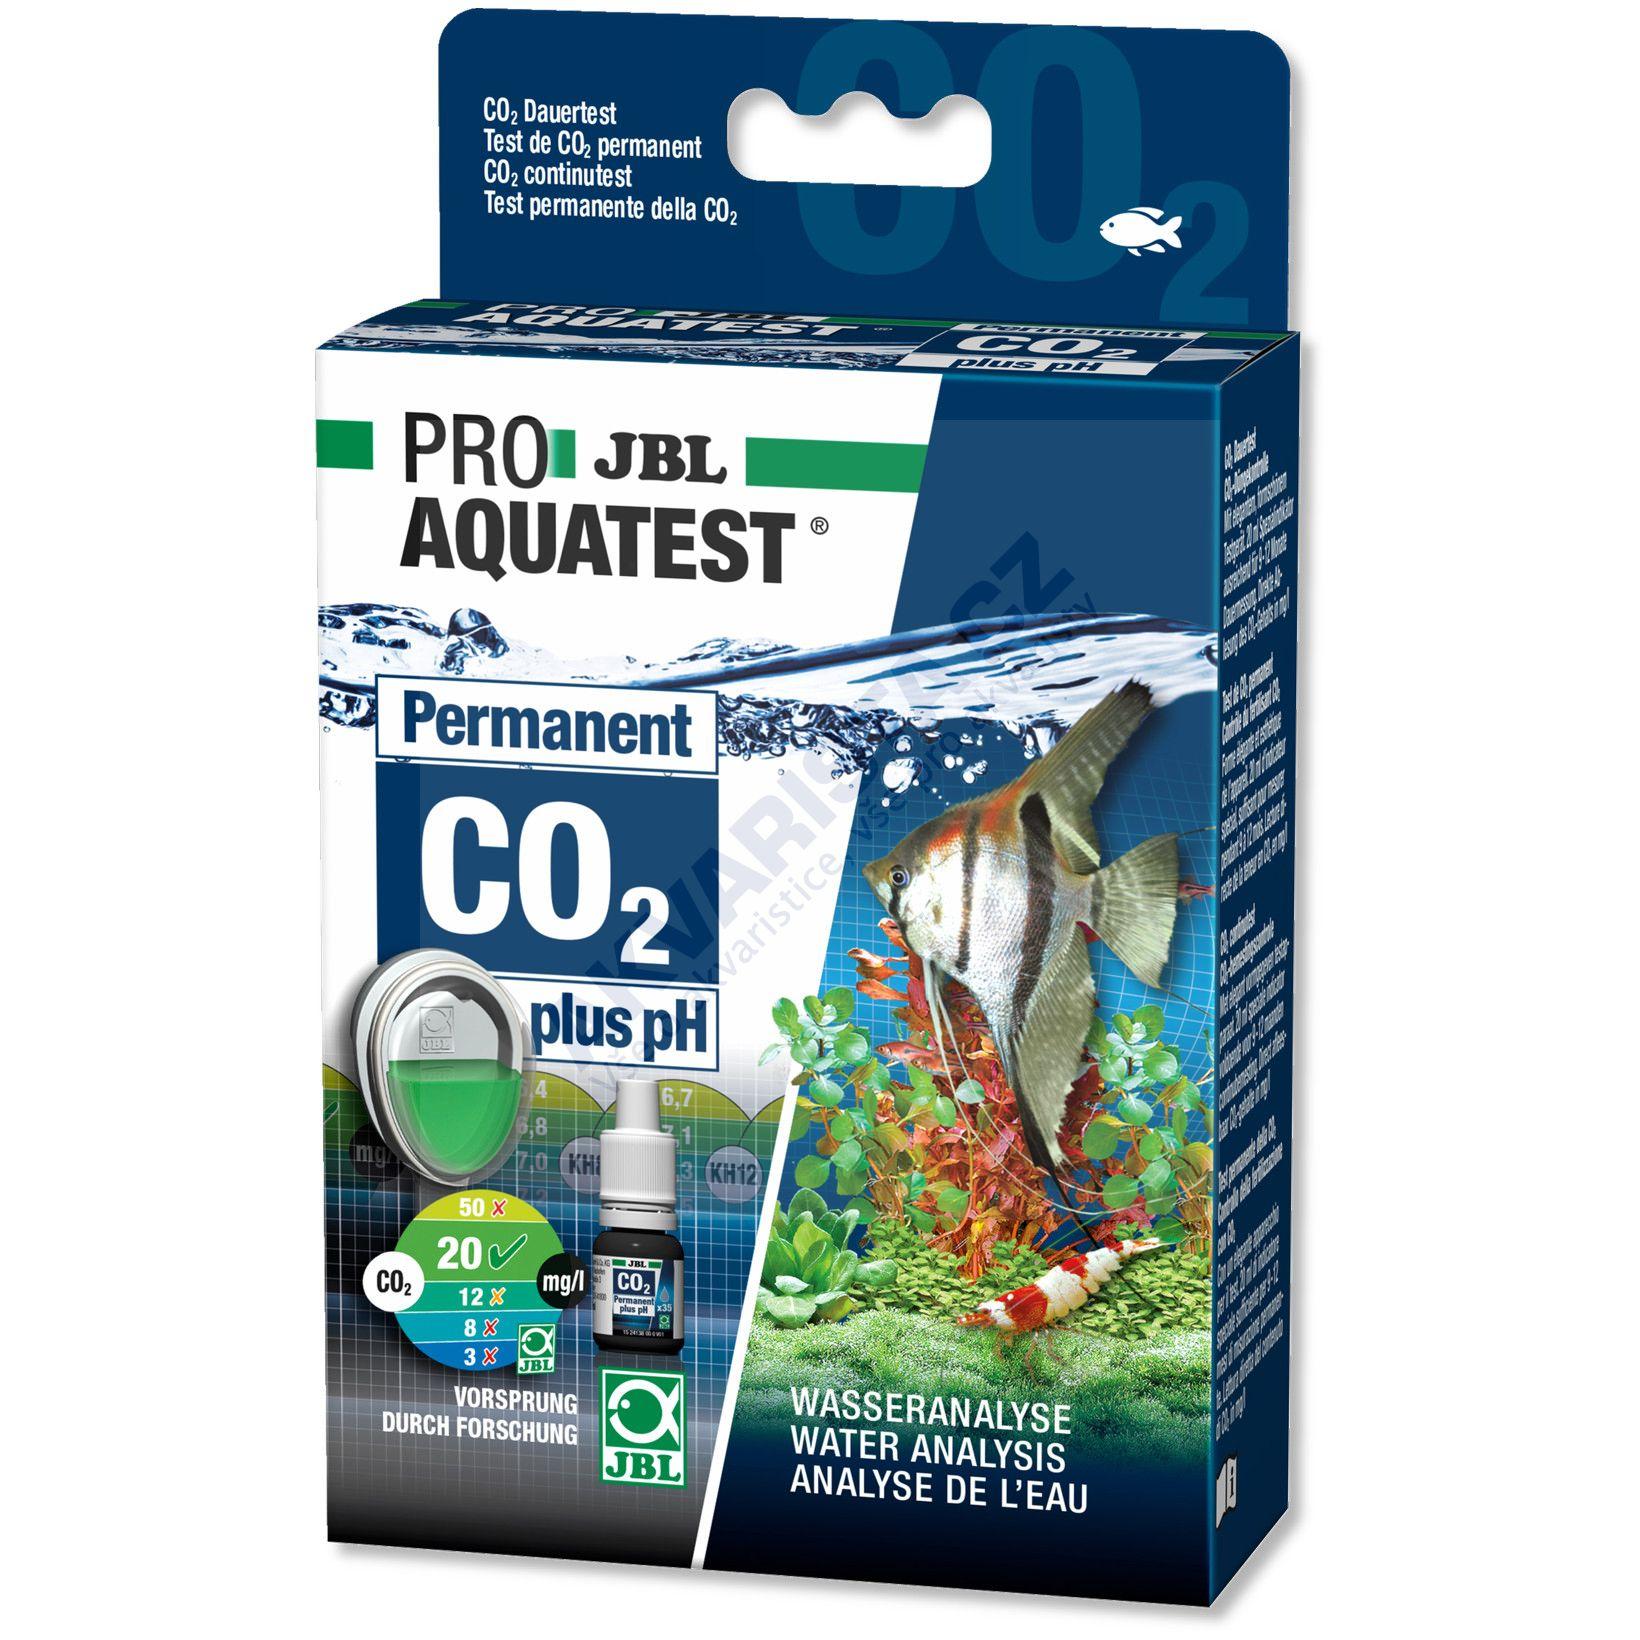 JBL PRO Aquatest Permanent CO2 plus pH